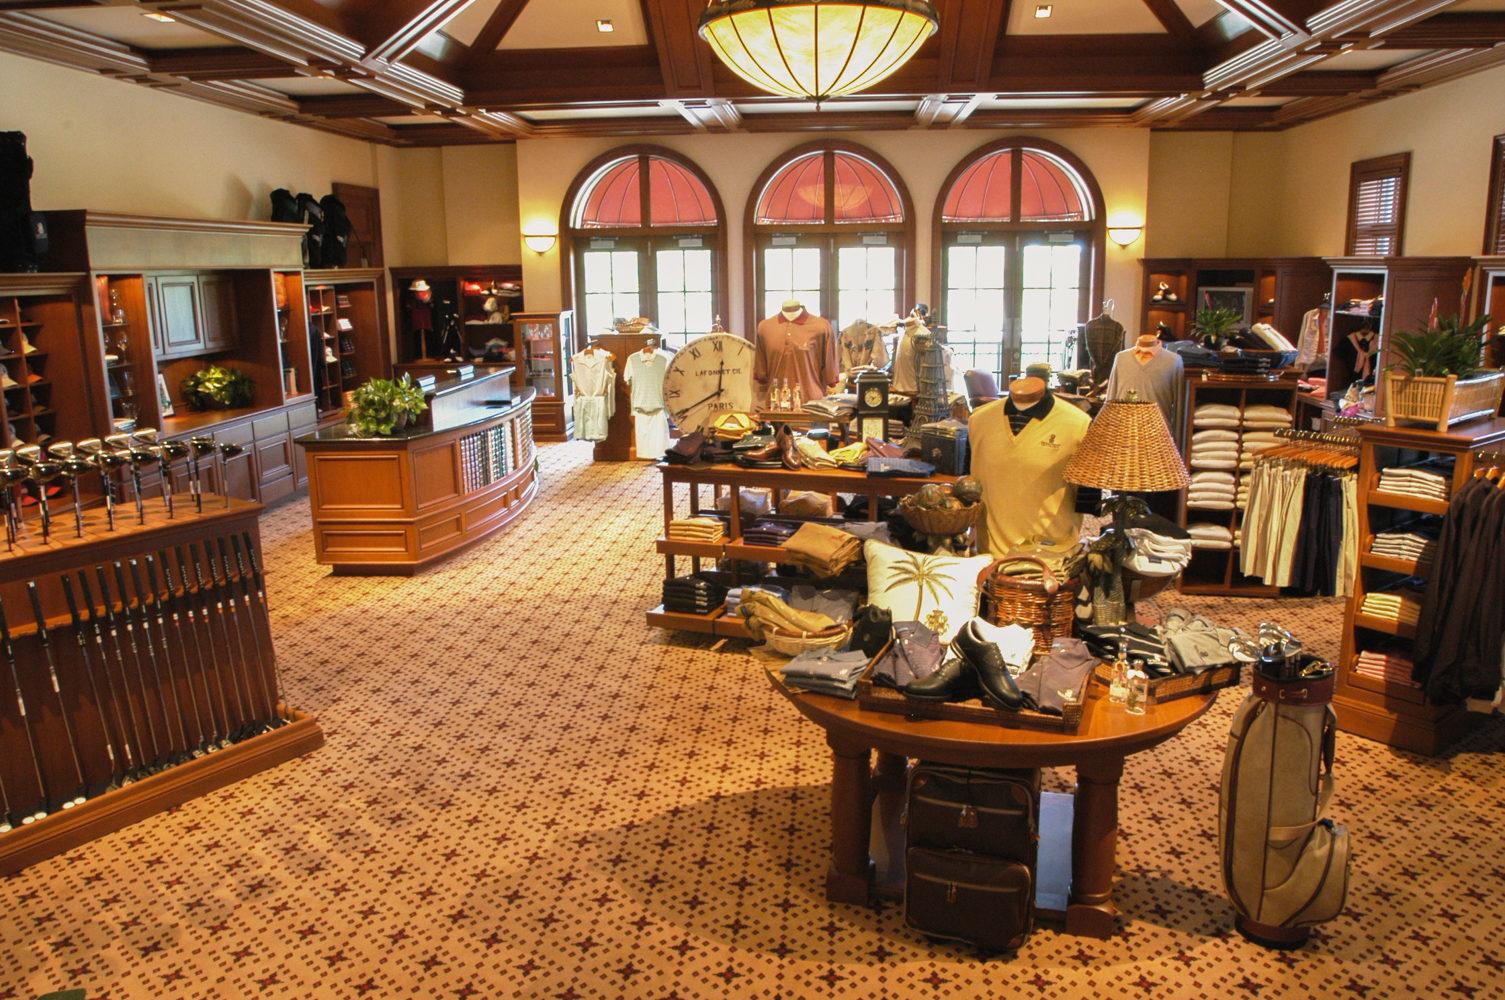 http://procraftgolf.com/wp-content/uploads/2017/02/Ritz-Carlton-Golf-Club-025-1-1505x1000.jpg